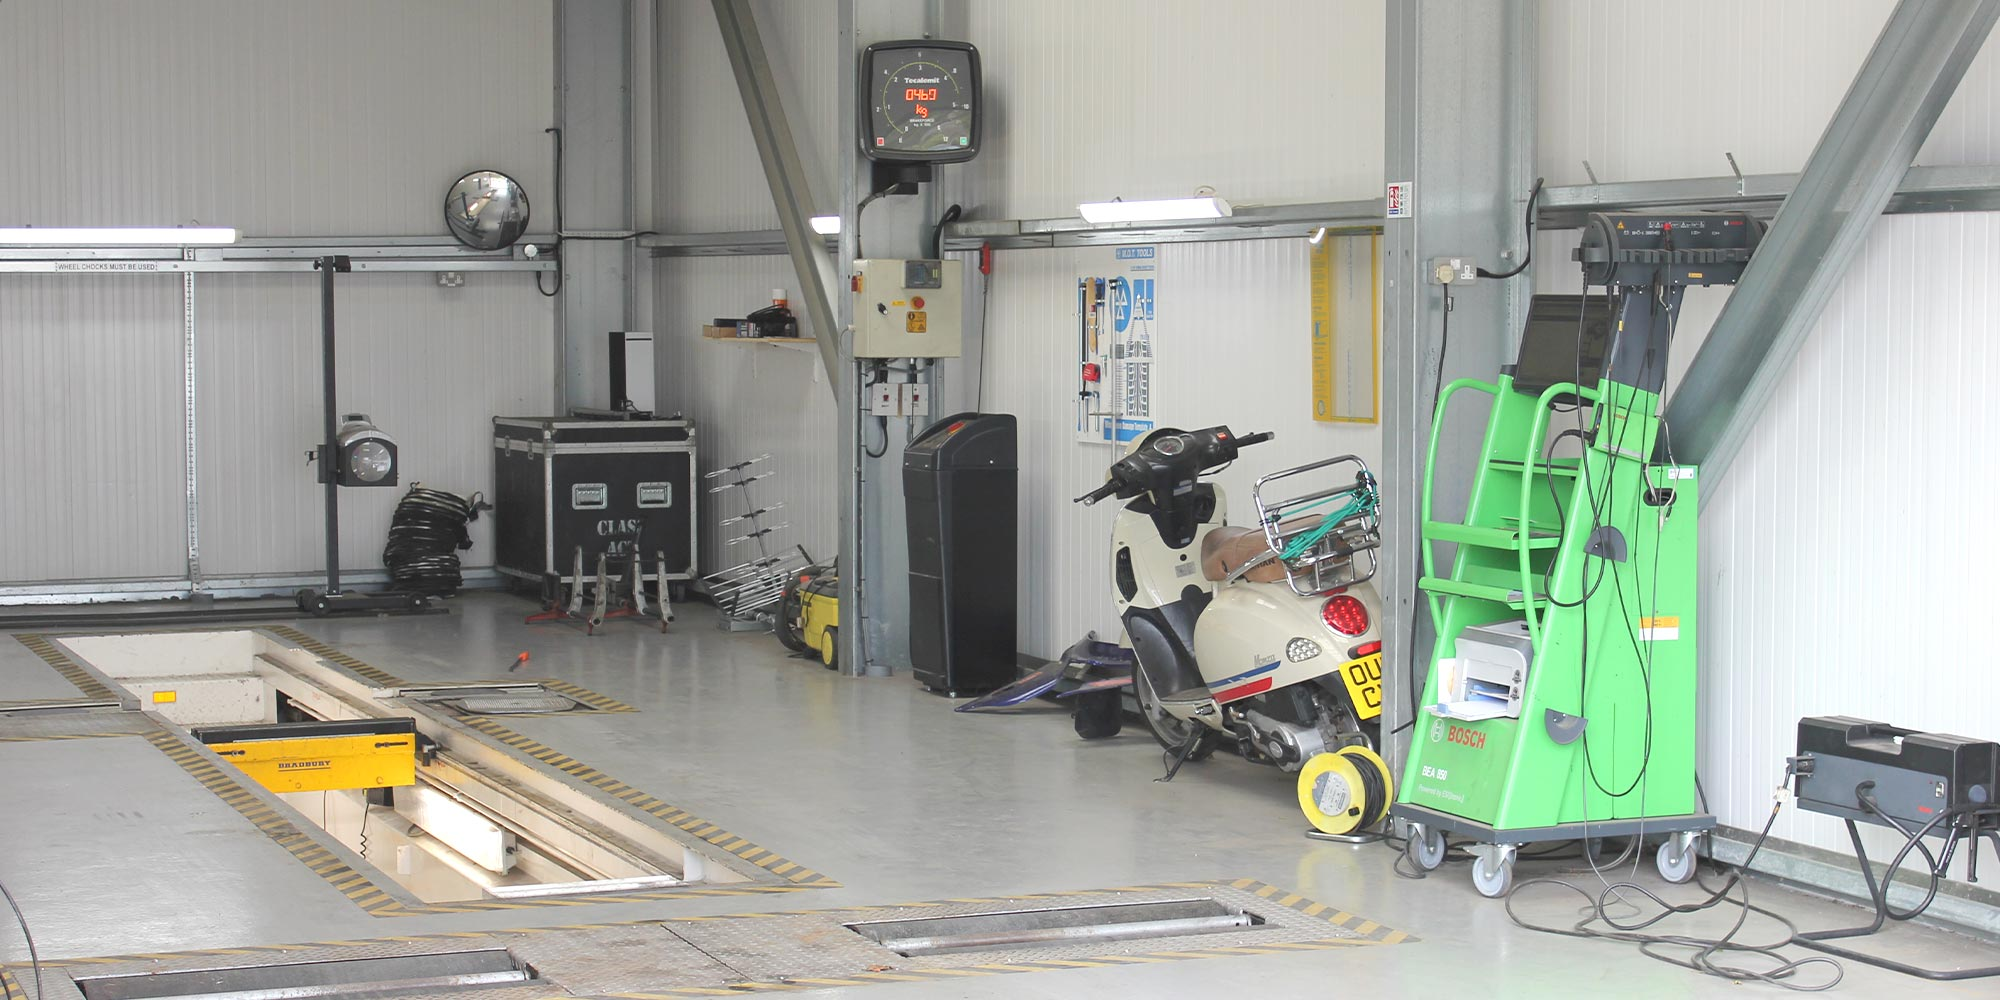 topcats racing mot testing station